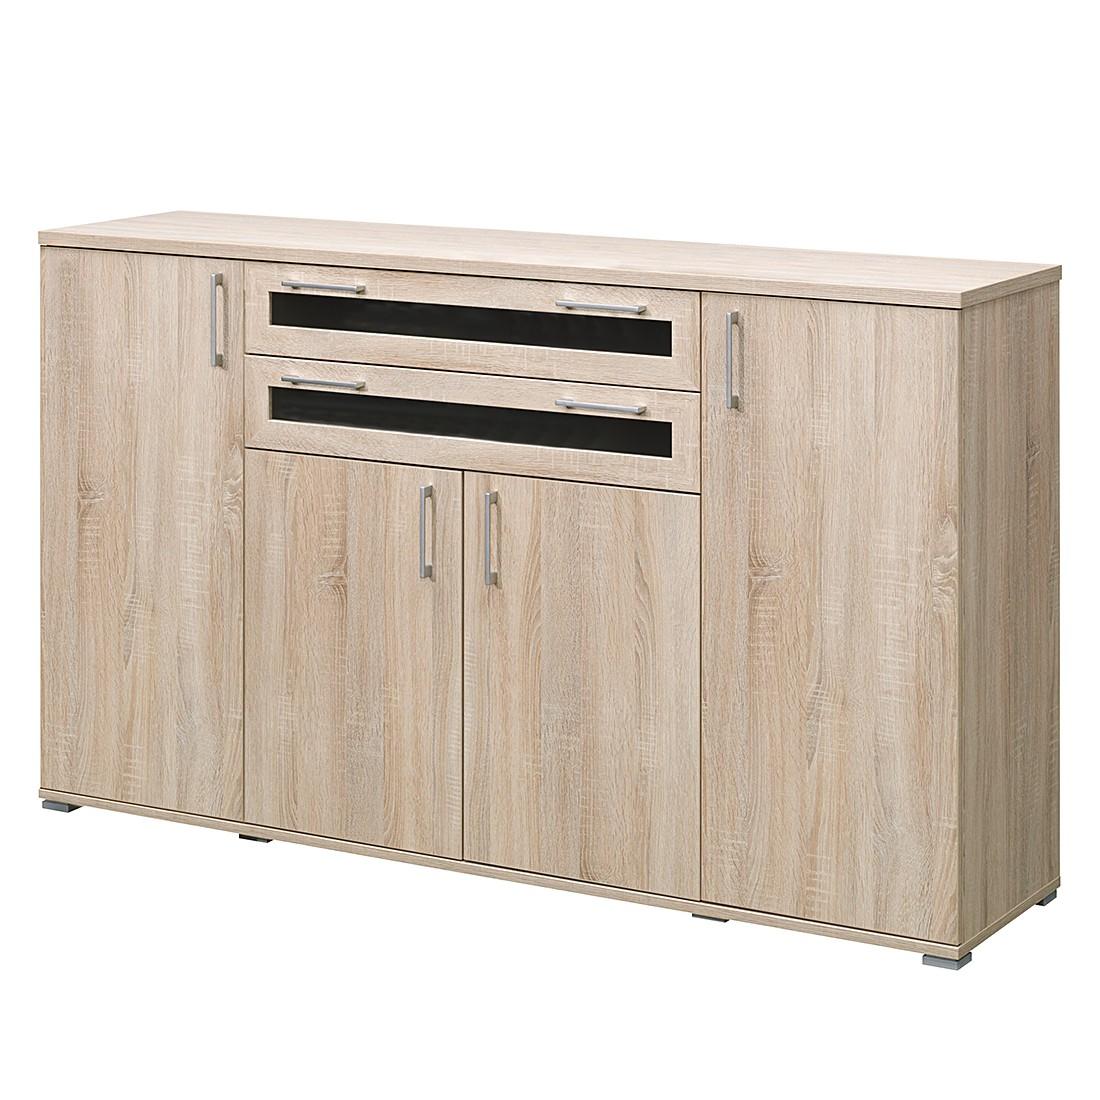 kommode rio art vii eiche dekor cs schmal g nstig. Black Bedroom Furniture Sets. Home Design Ideas